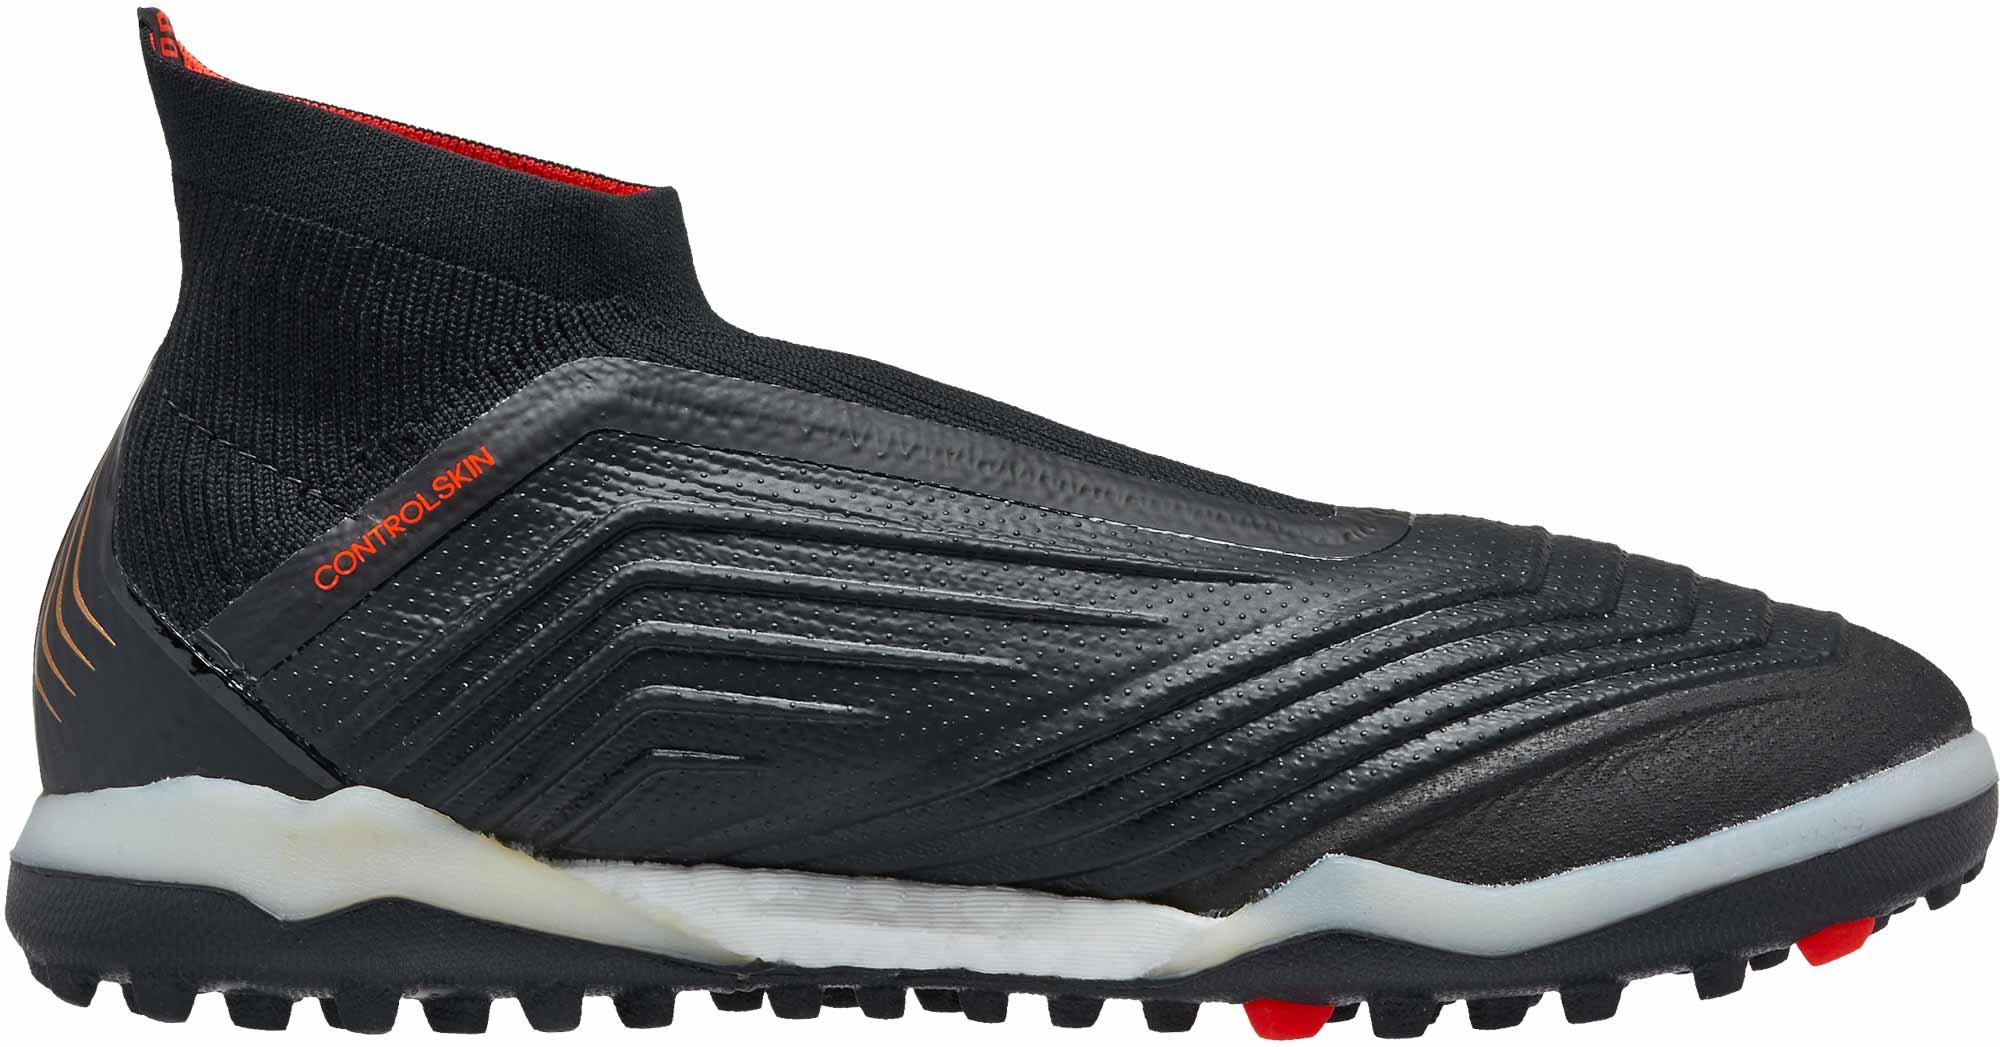 on sale cf57d e6e7a adidas Predator Tango 18 TF – BlackSolar Red